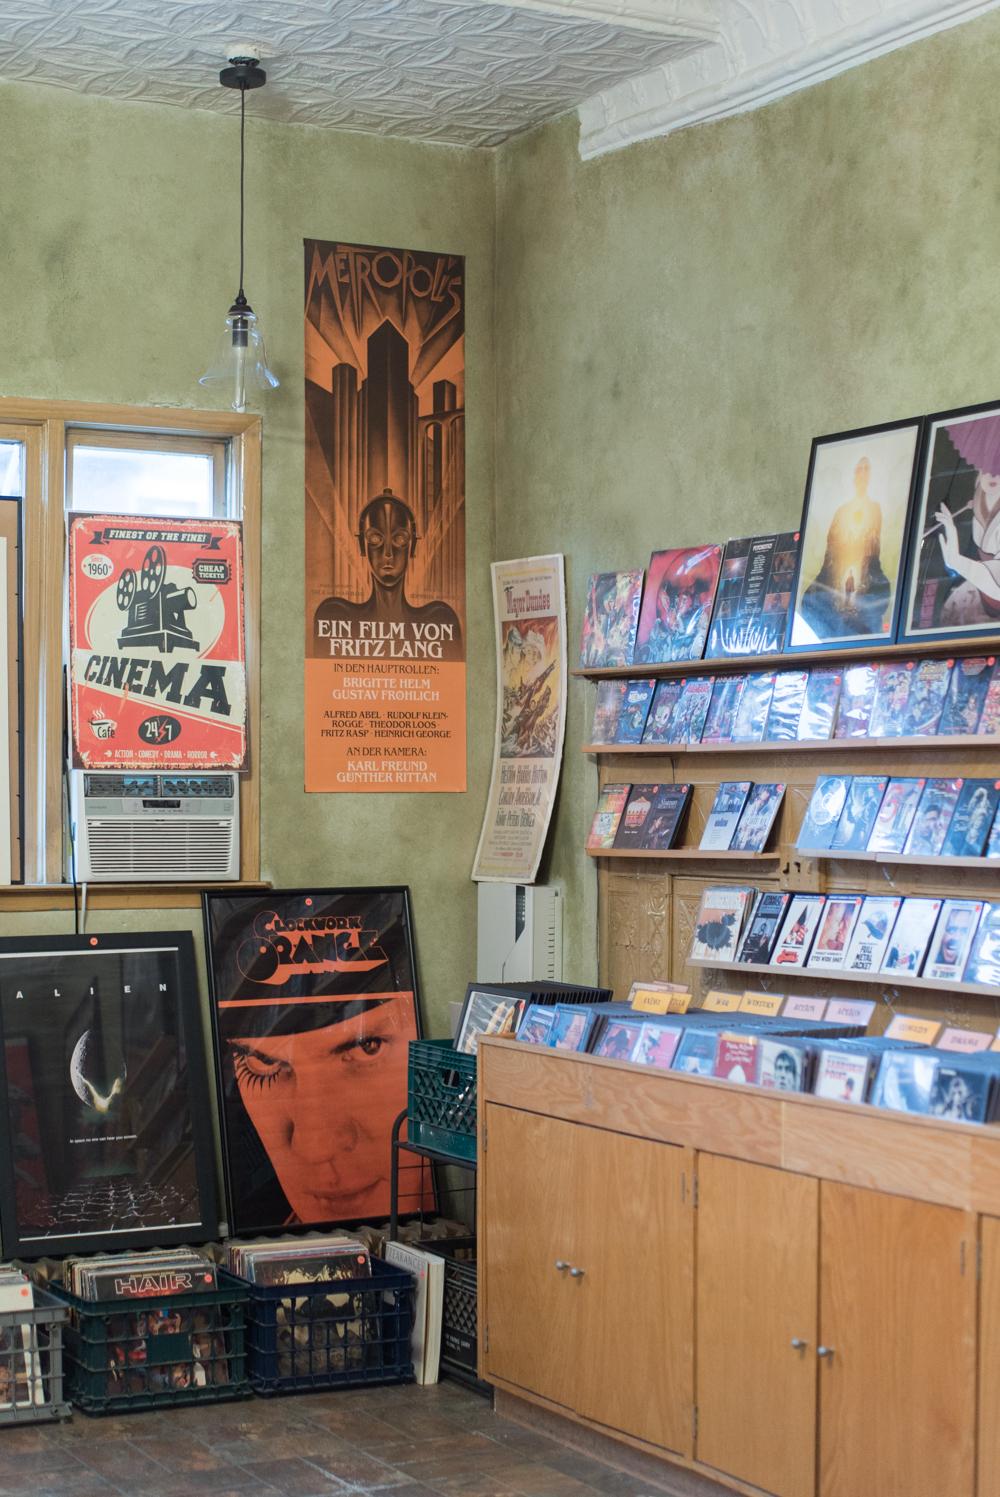 Besides movies Film Noir Cinema sells used records.